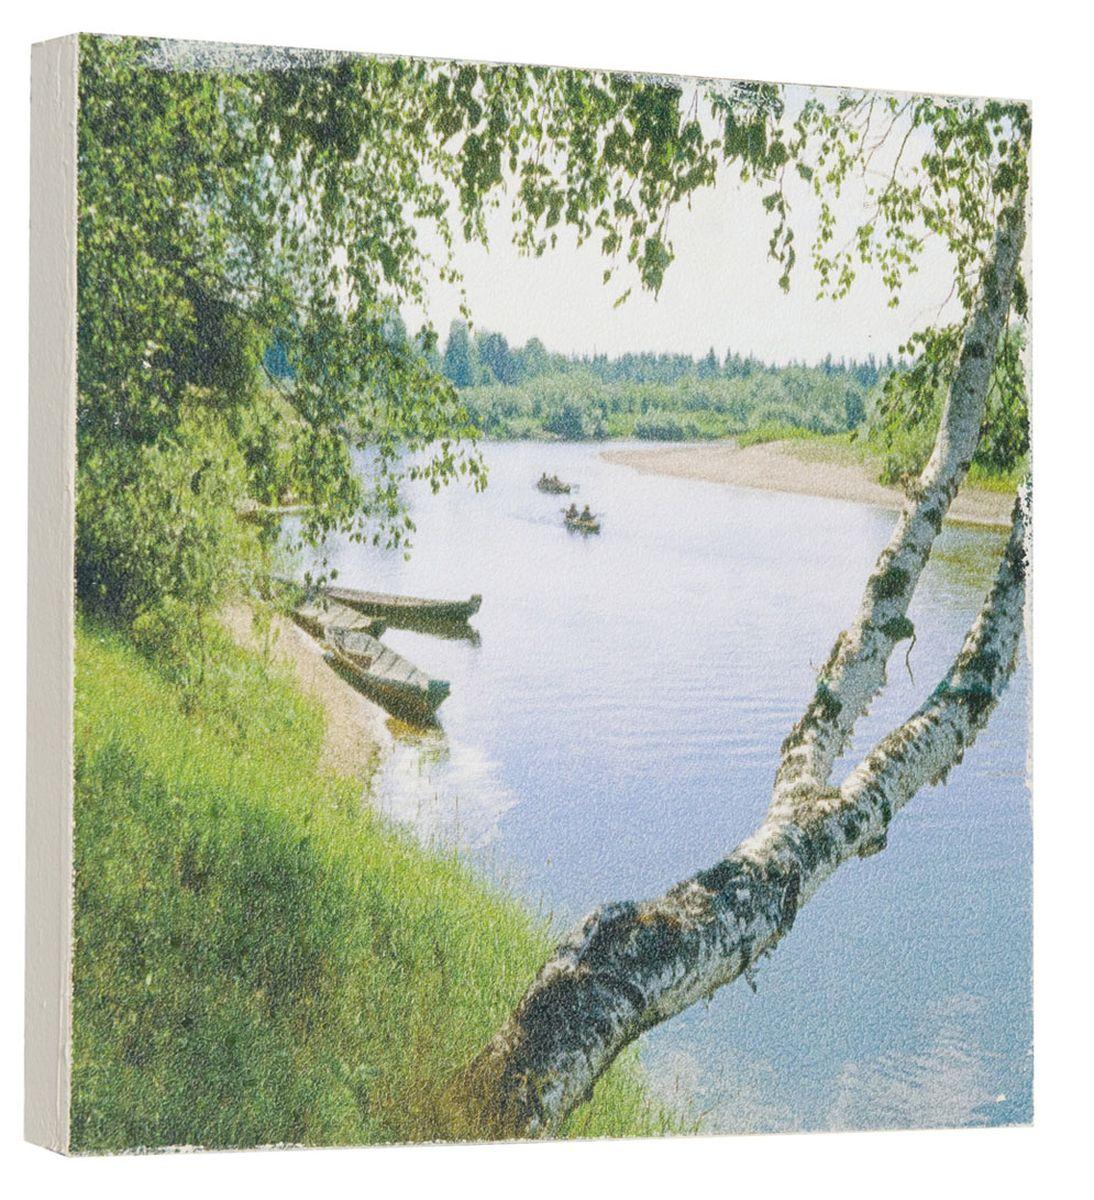 Картина Красивые березки у реки, 22 х 22 см